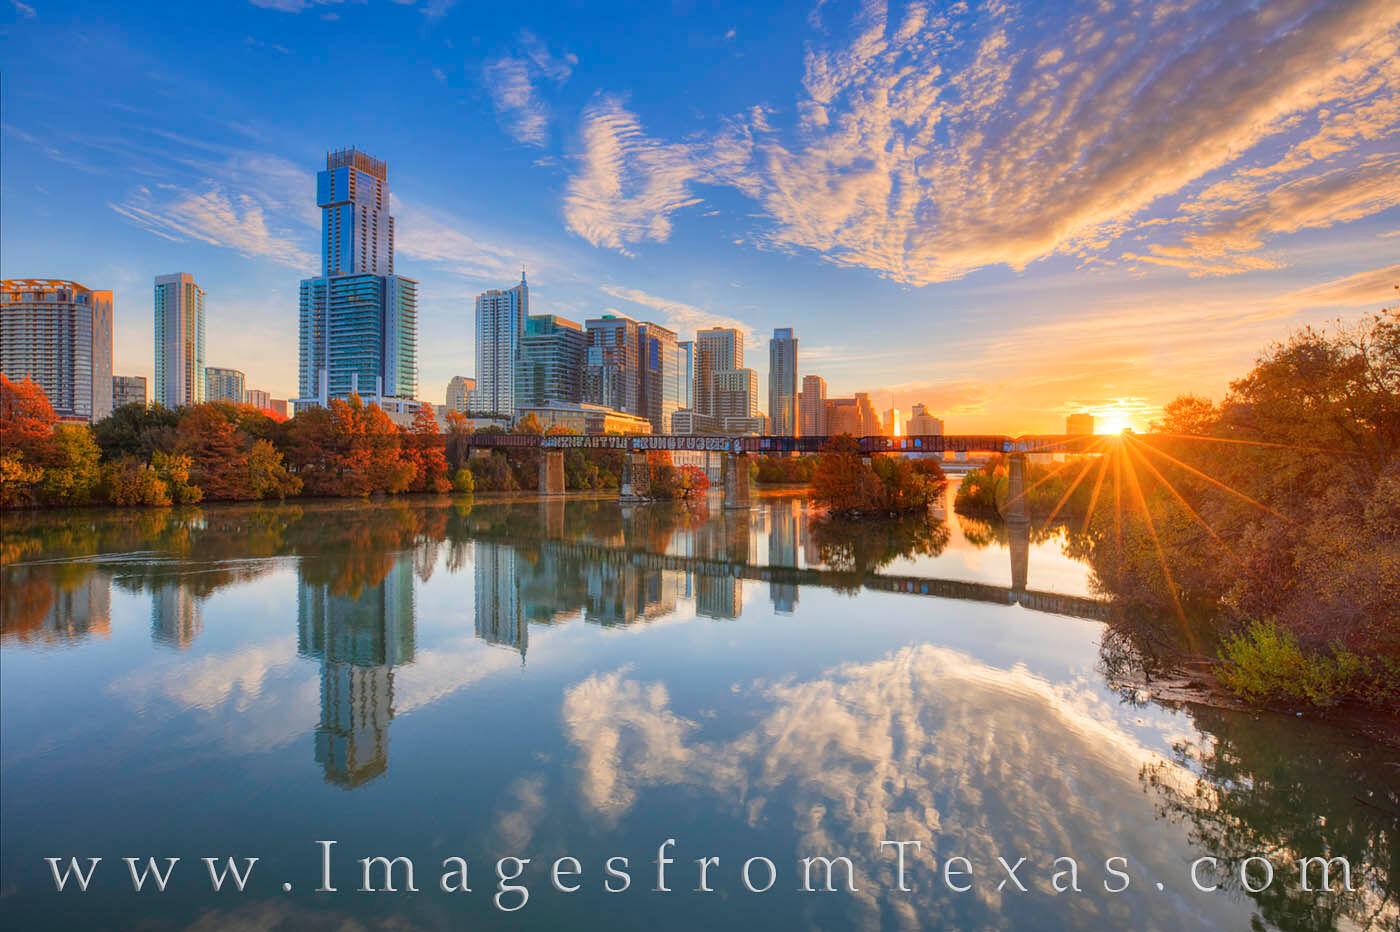 austin skyline, sunrise, pfluger bridge, pedestrian bridge, downtown austin, ladybird lake, town lake, austin, zilker park, texas sunrise, autumn, fall colors, photo